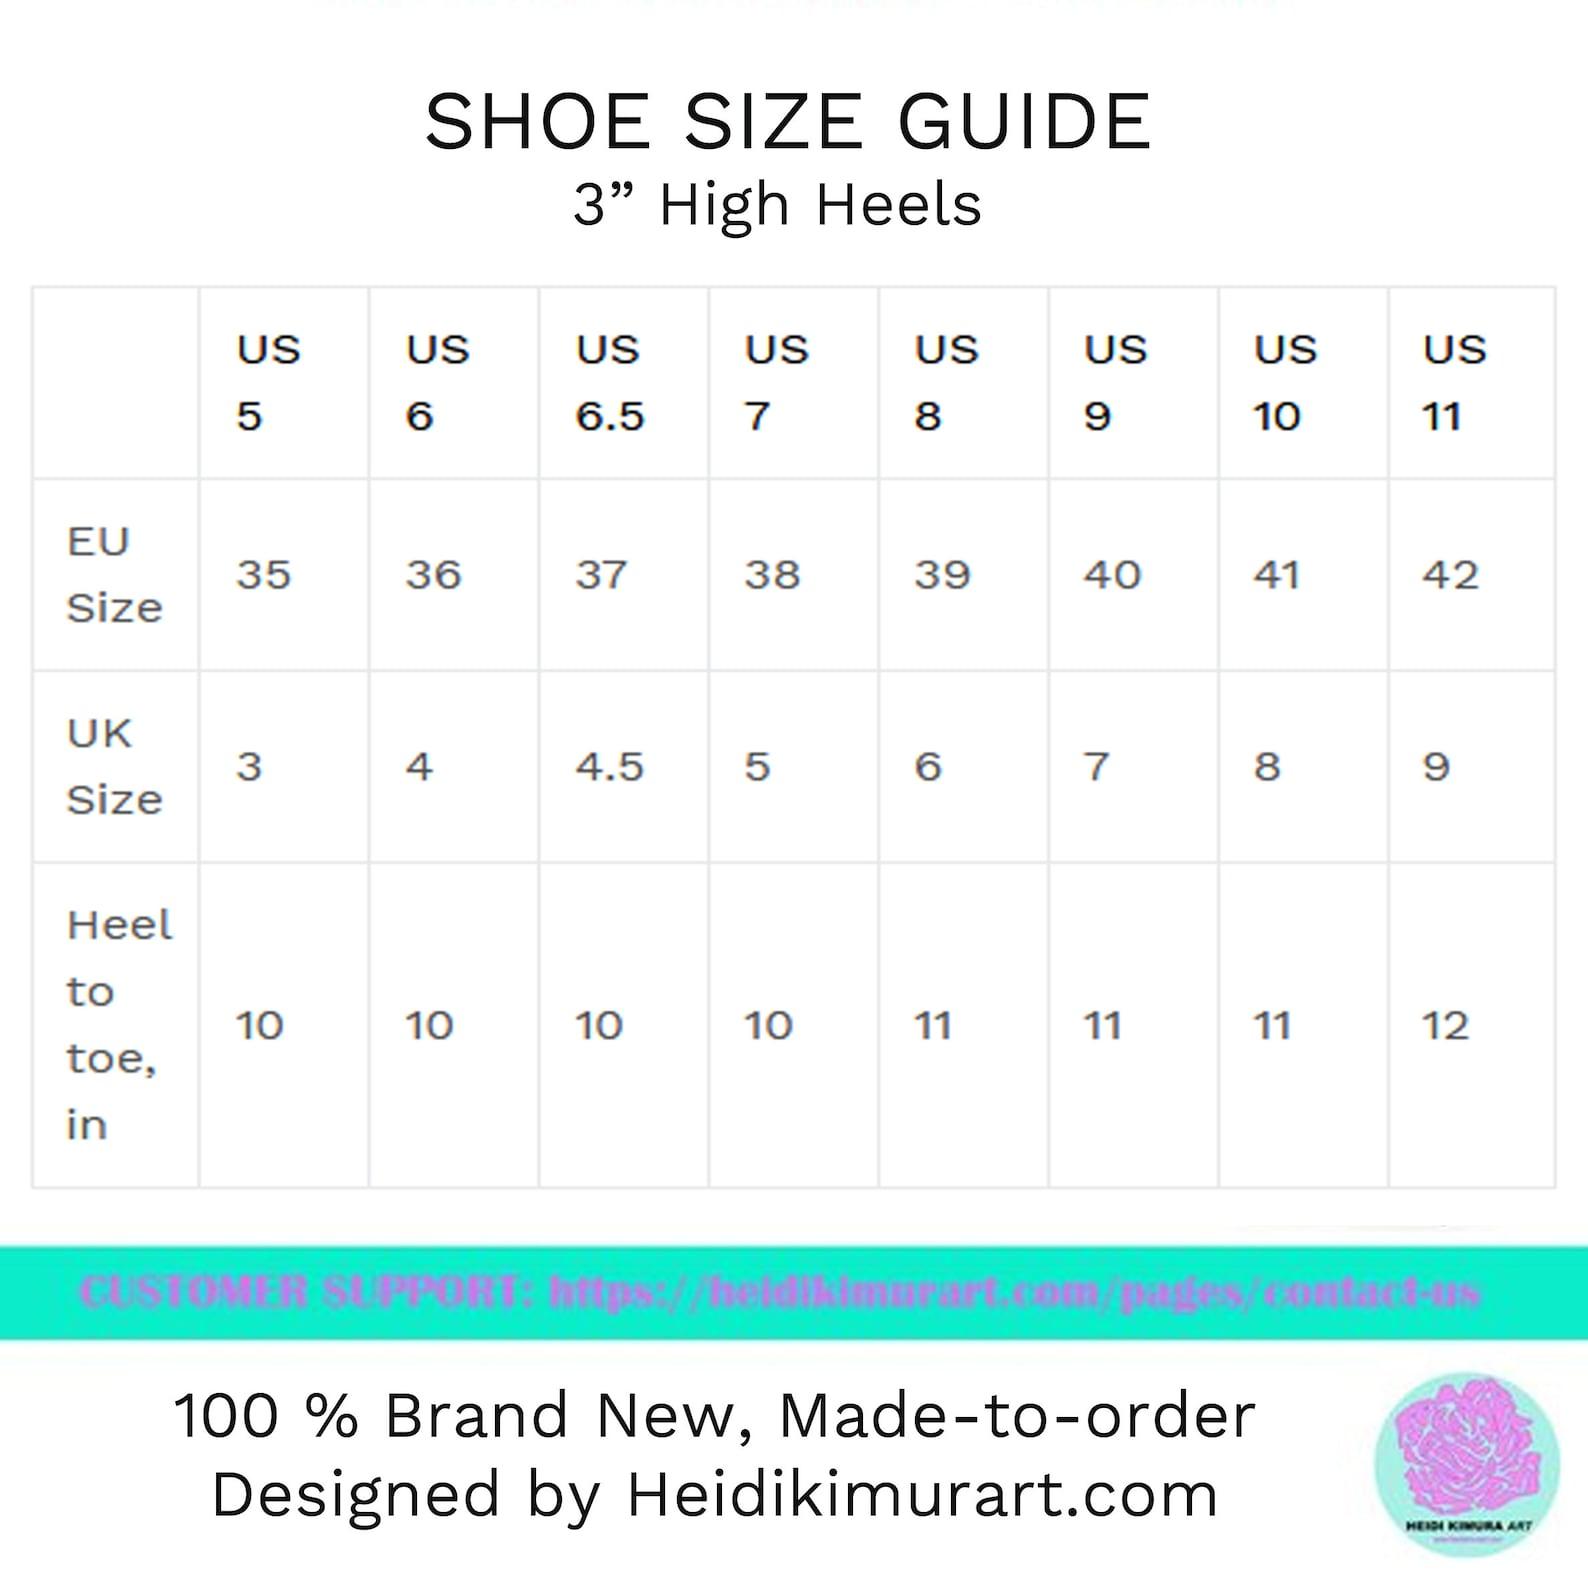 kana ballet pink rose floral print purple pink rose women's high heels canvas shoes (us size 5-11), 80s floral heel, rose fl